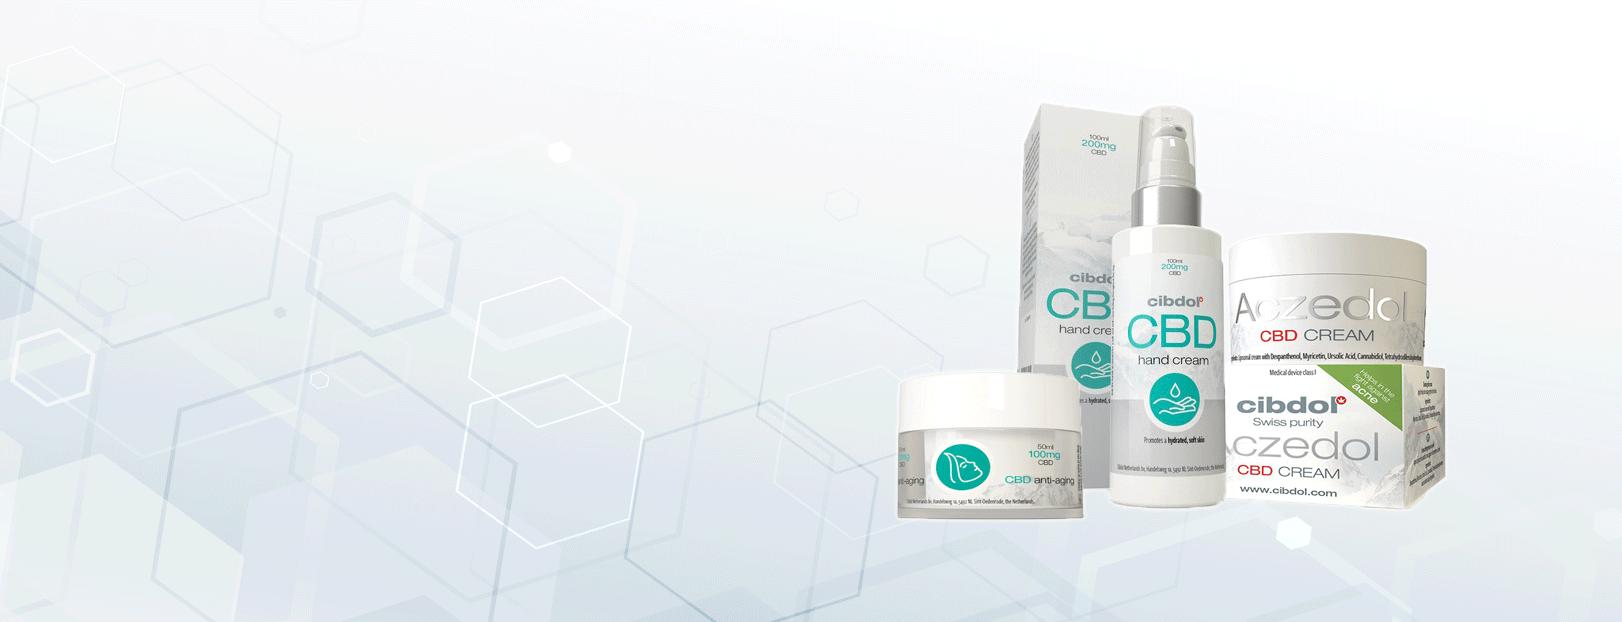 Banner of cbd Cream